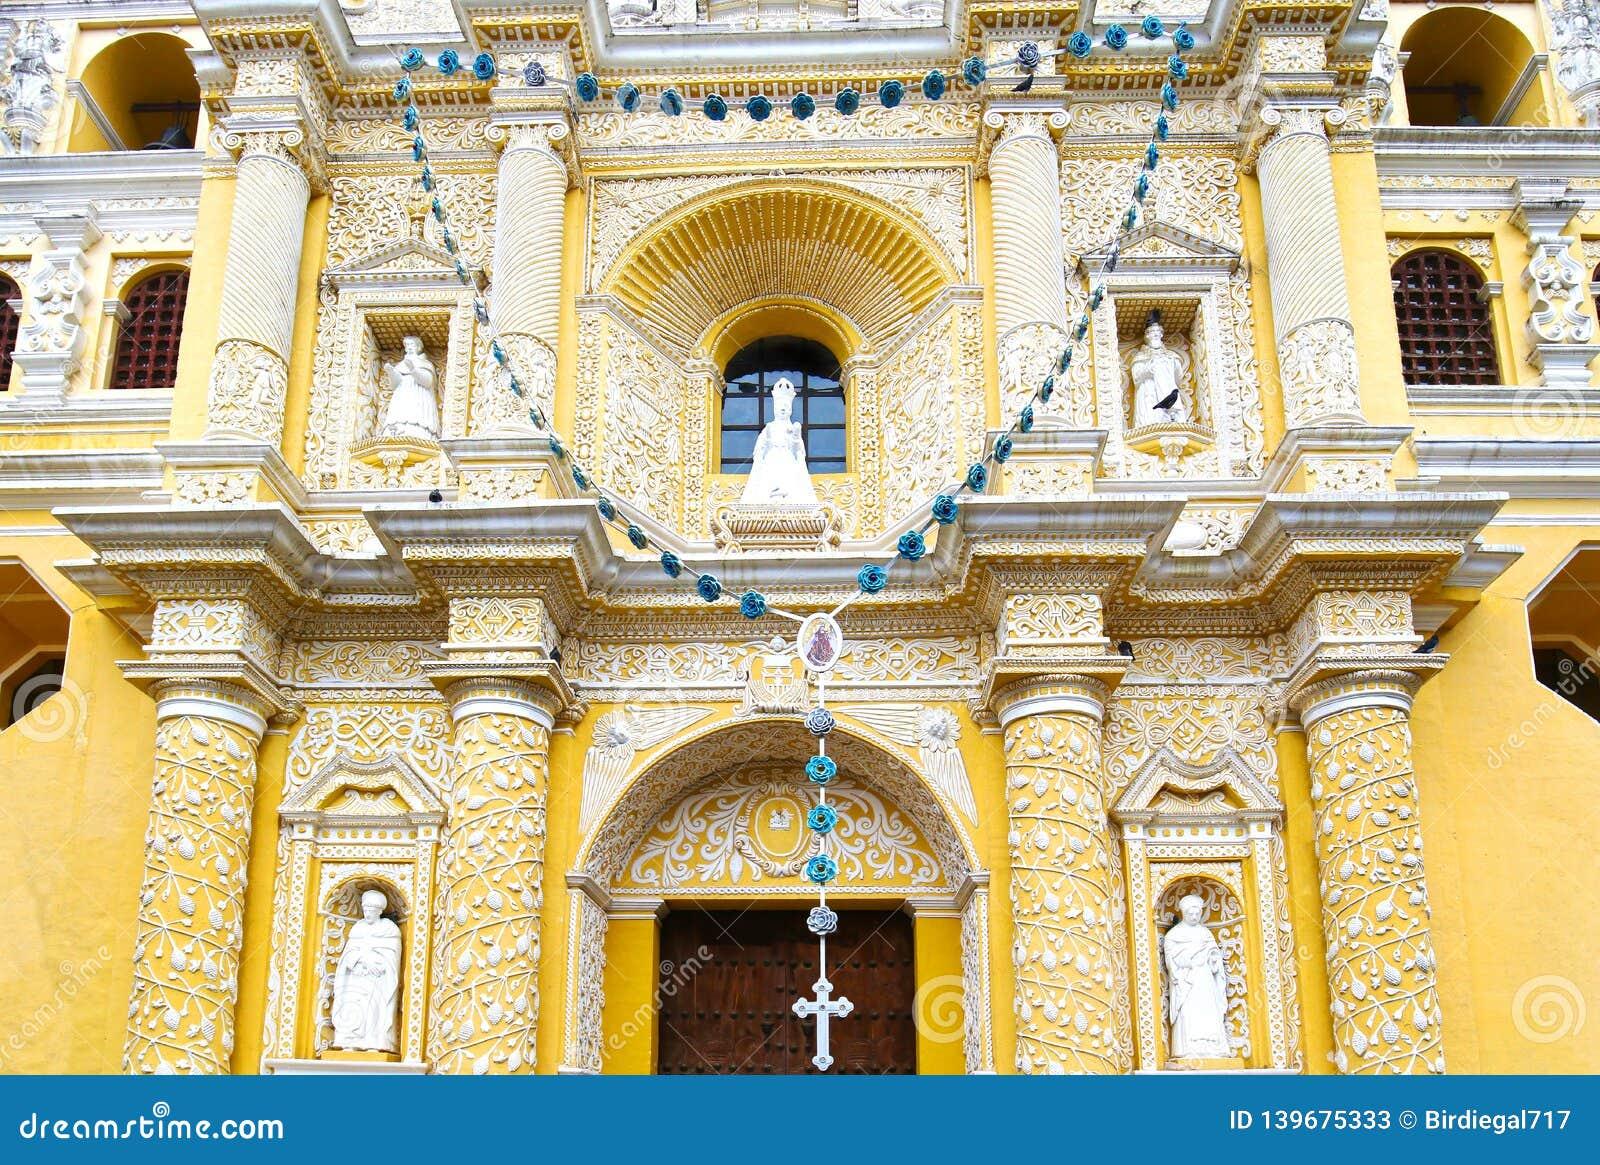 Antigua City, Guatemala. San Jose cathedral at Plaza Mayor square. UNESCO site